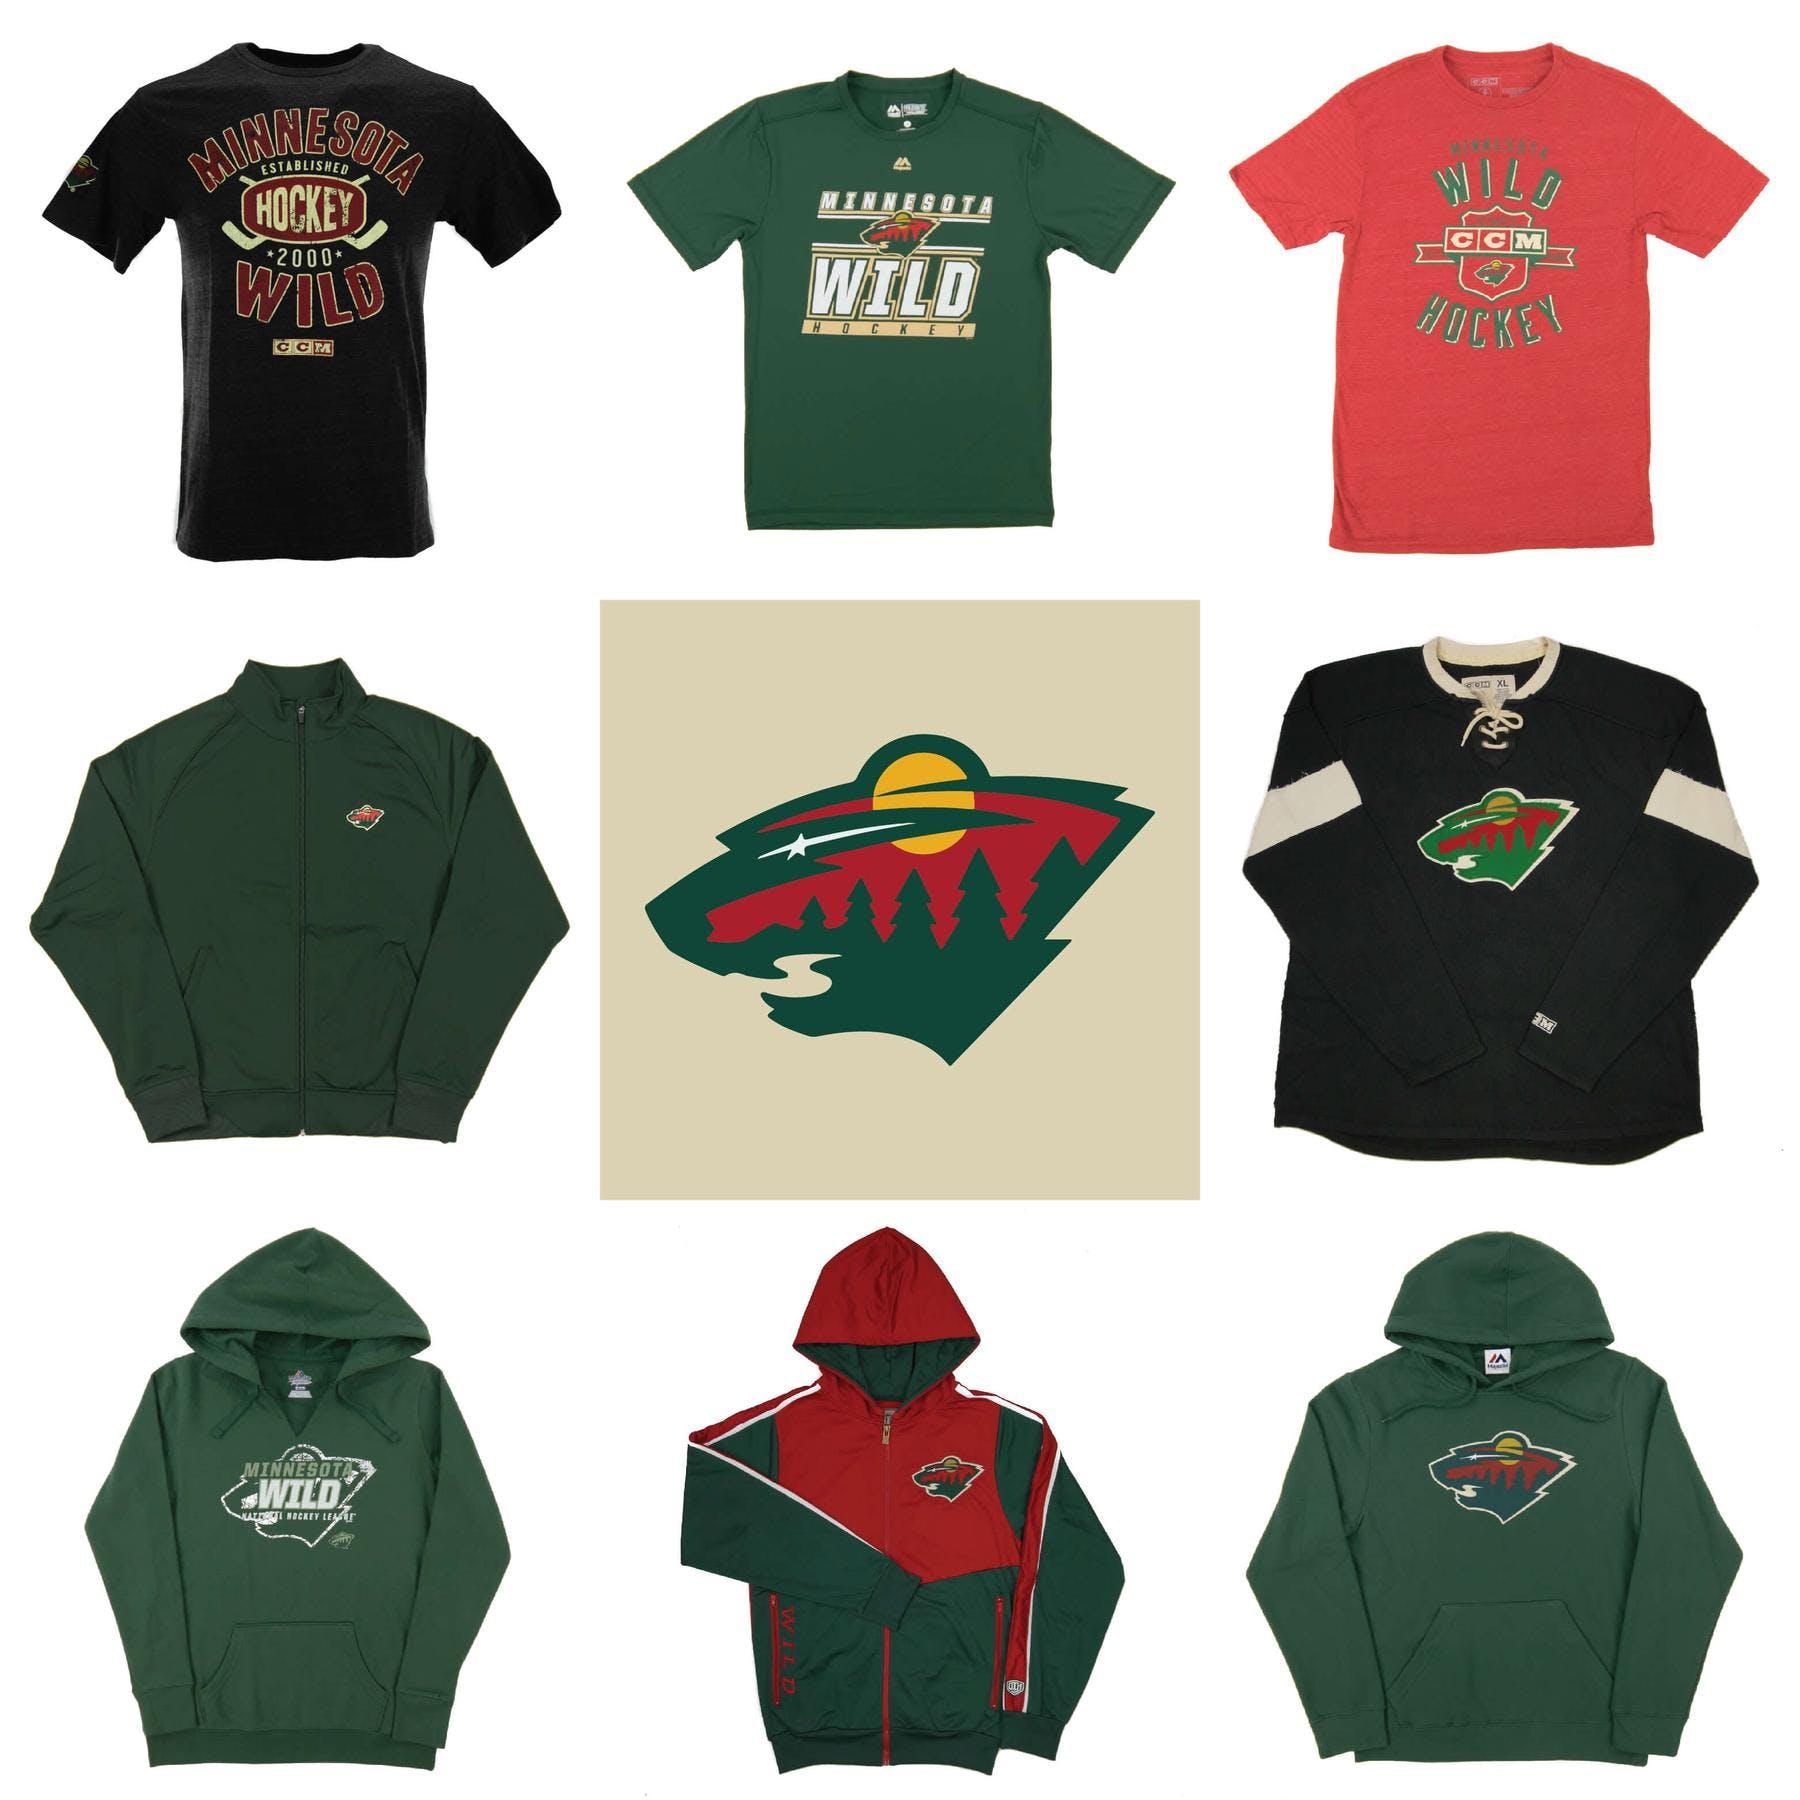 hot sales 455f9 4ef51 Minnesota Wild Officially Licensed NHL Apparel Liquidation - 1,650+ Items,   70,600+ SRP!   DA Card World